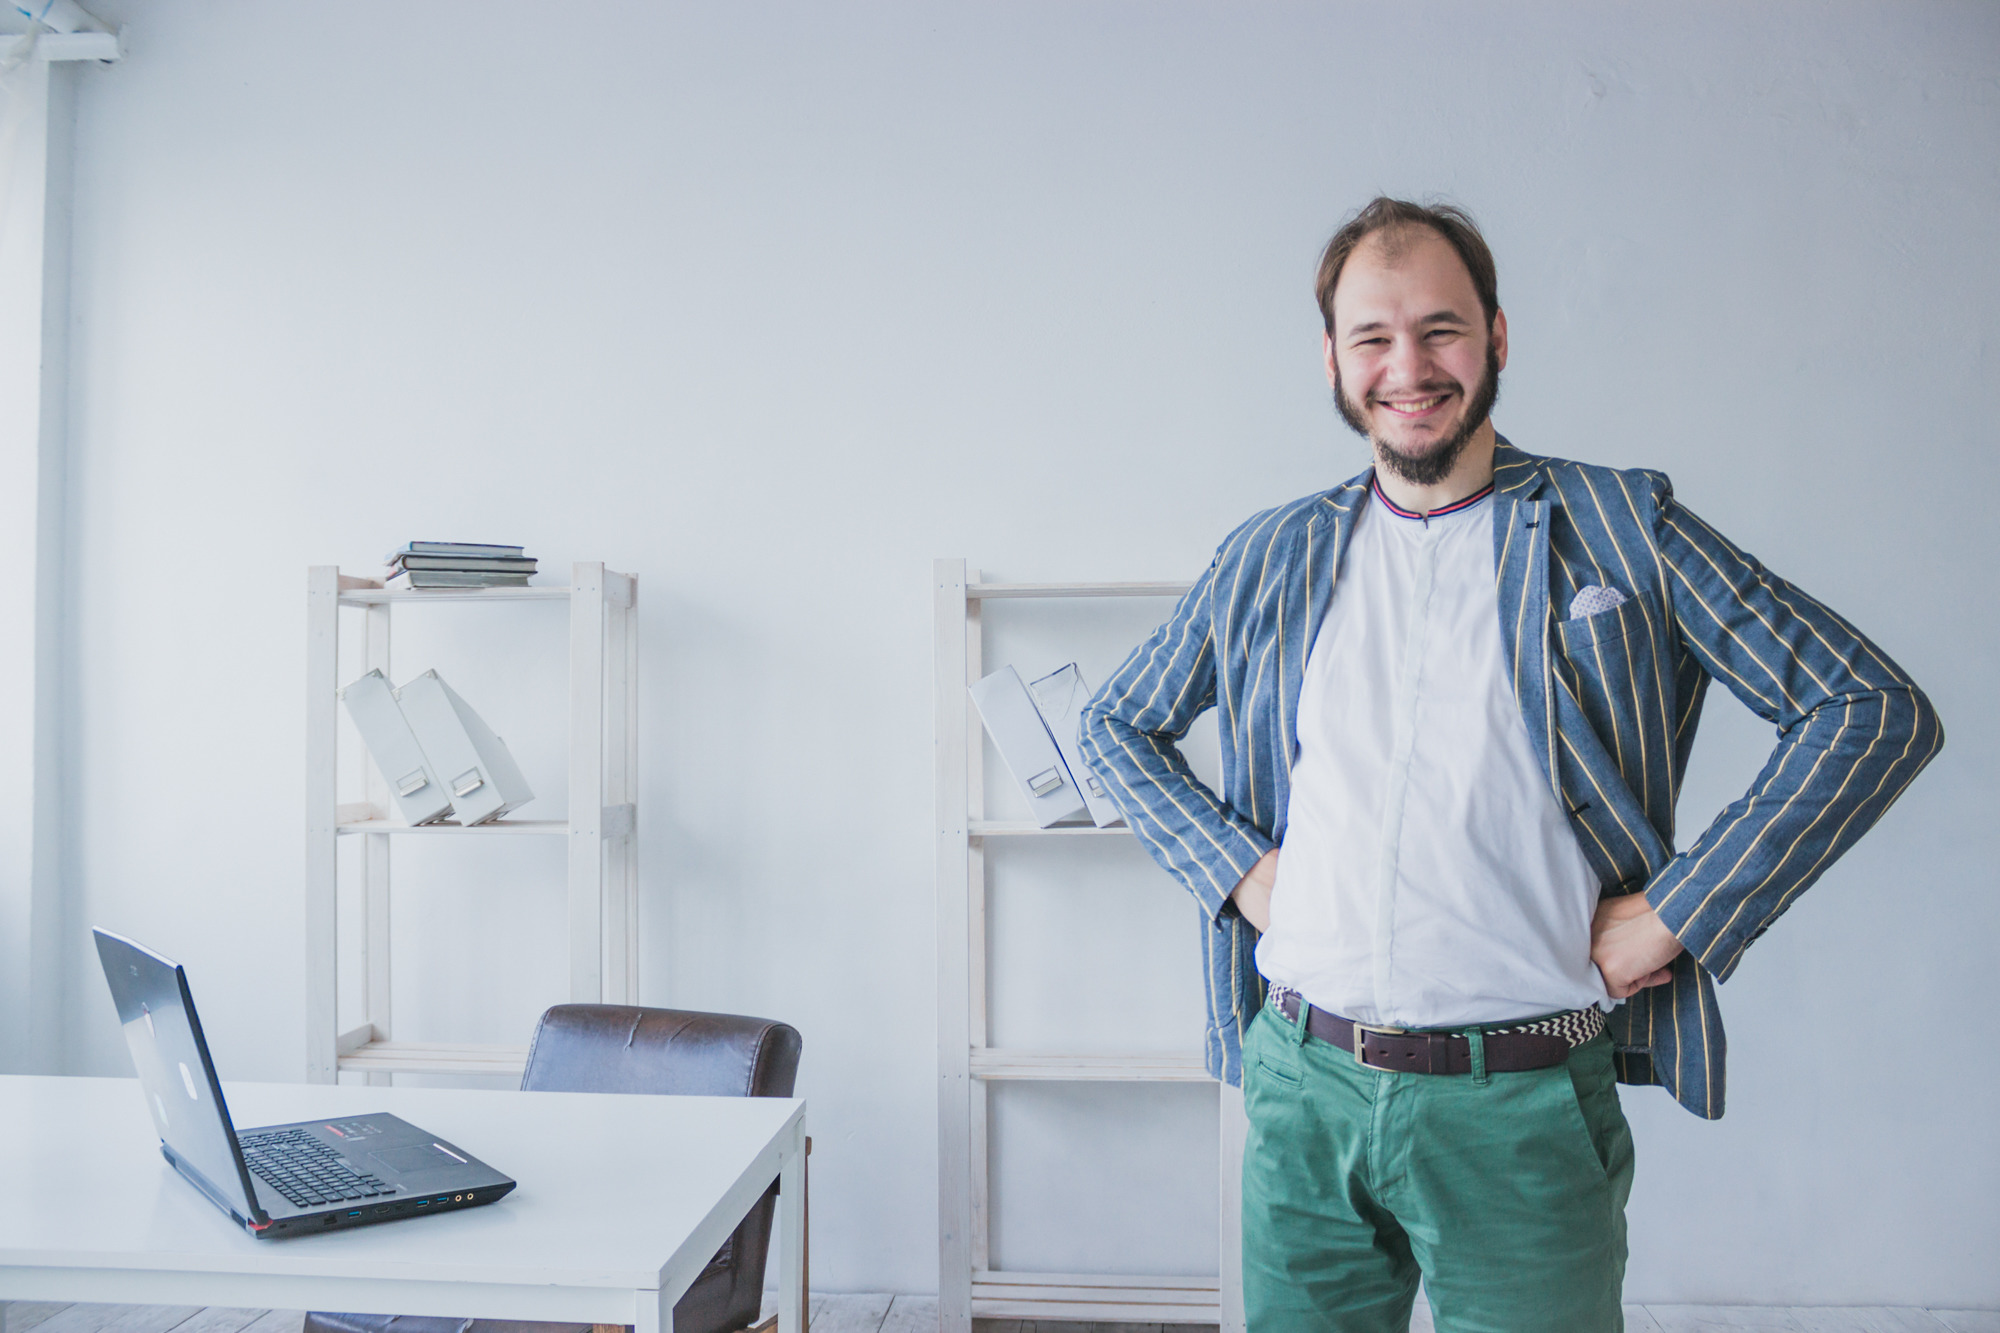 Павел Вейник, фото: Михаил Бабурчик